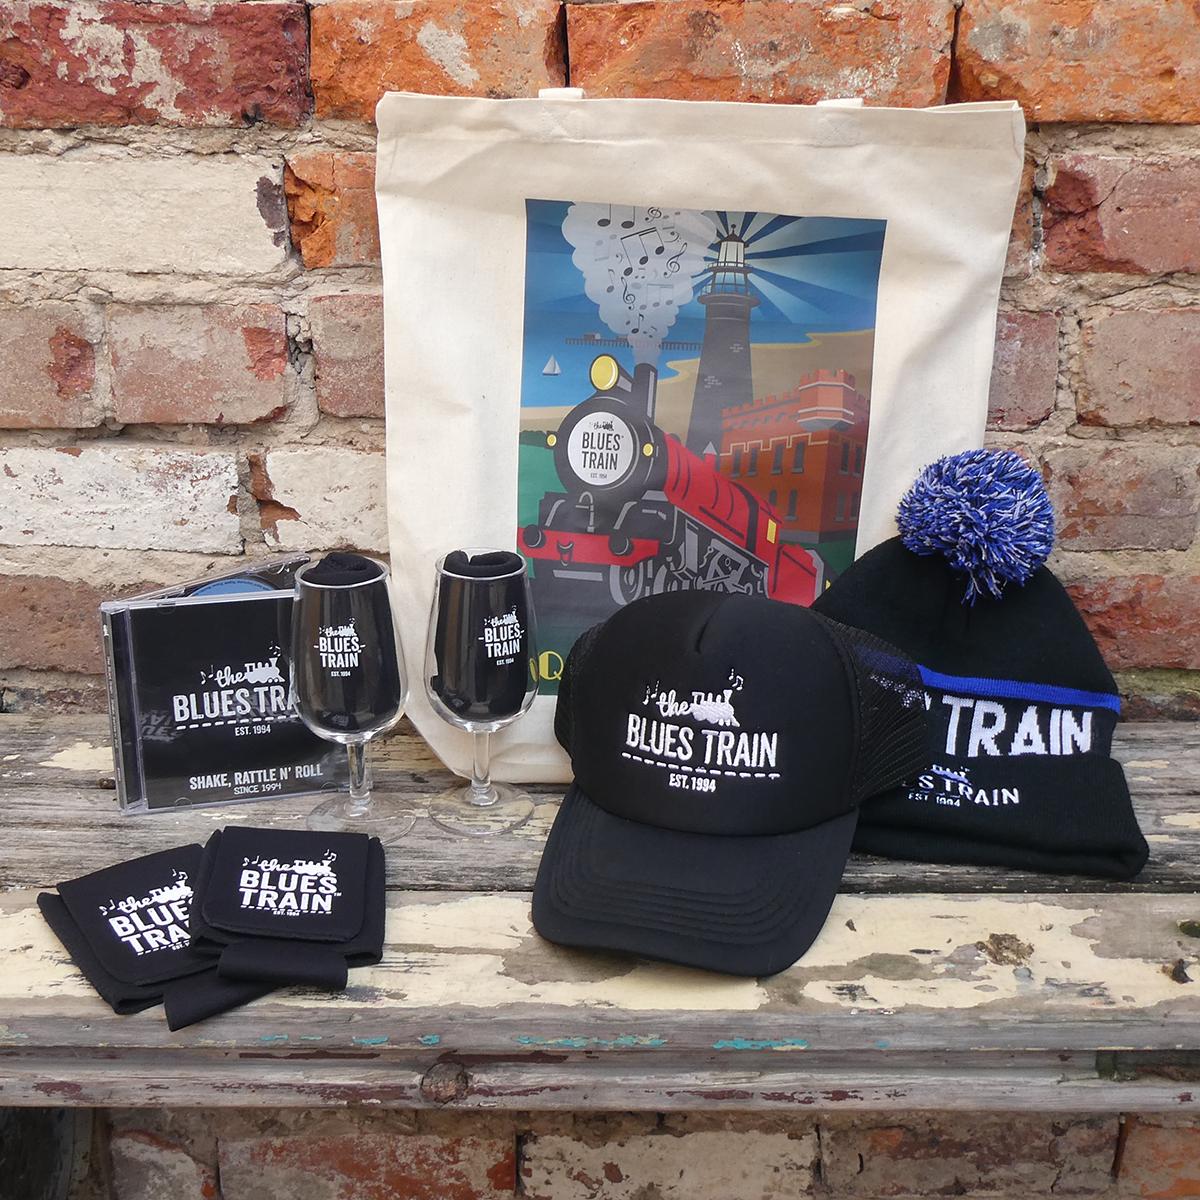 Ultimate Blues Train Merch Pack - Calico Bag